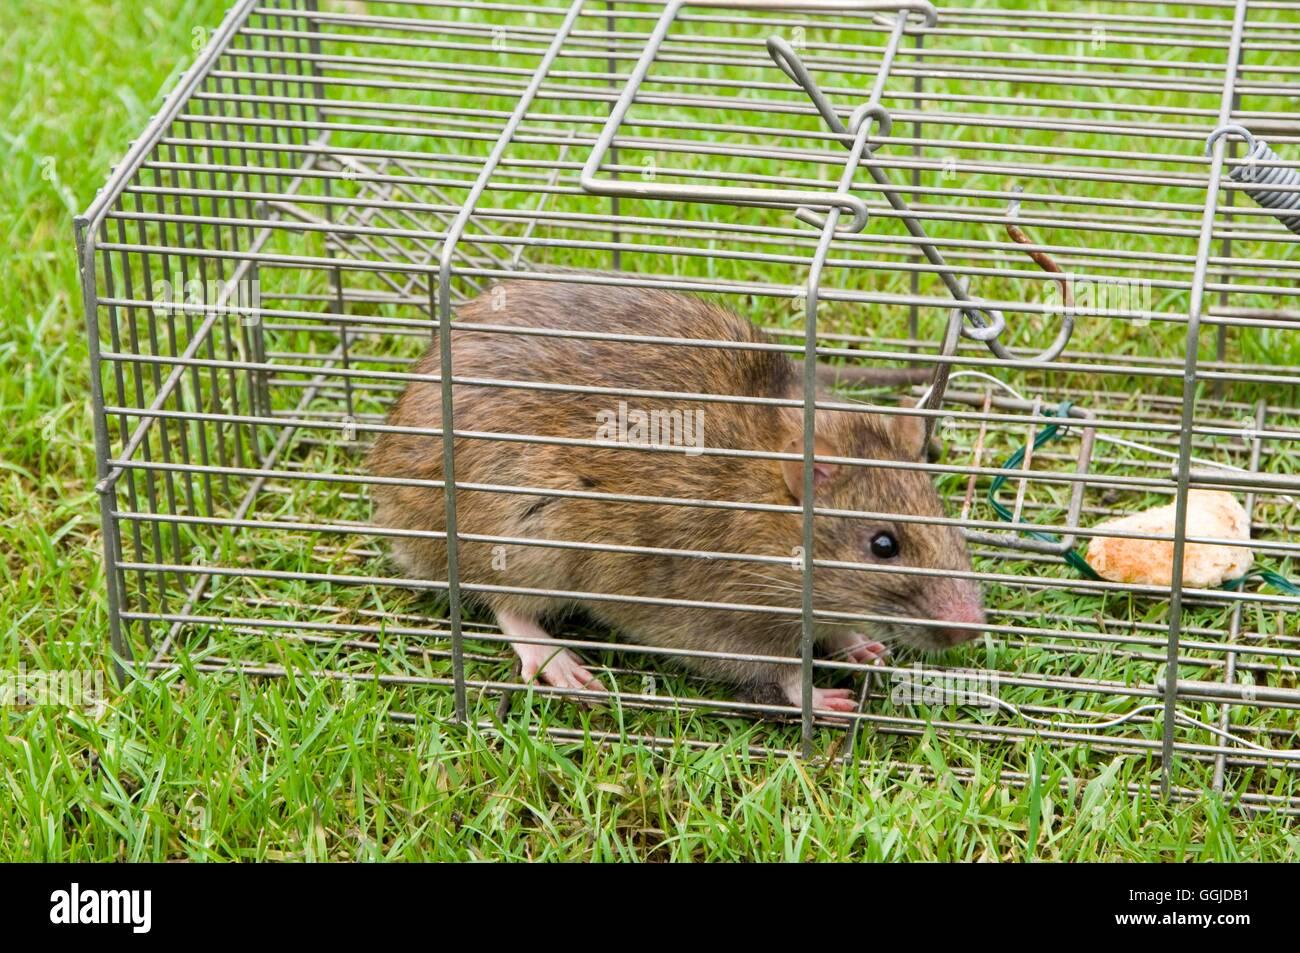 Rat- in humane trap- - (Rattus norvegieus)   MIW250775 - Stock Image